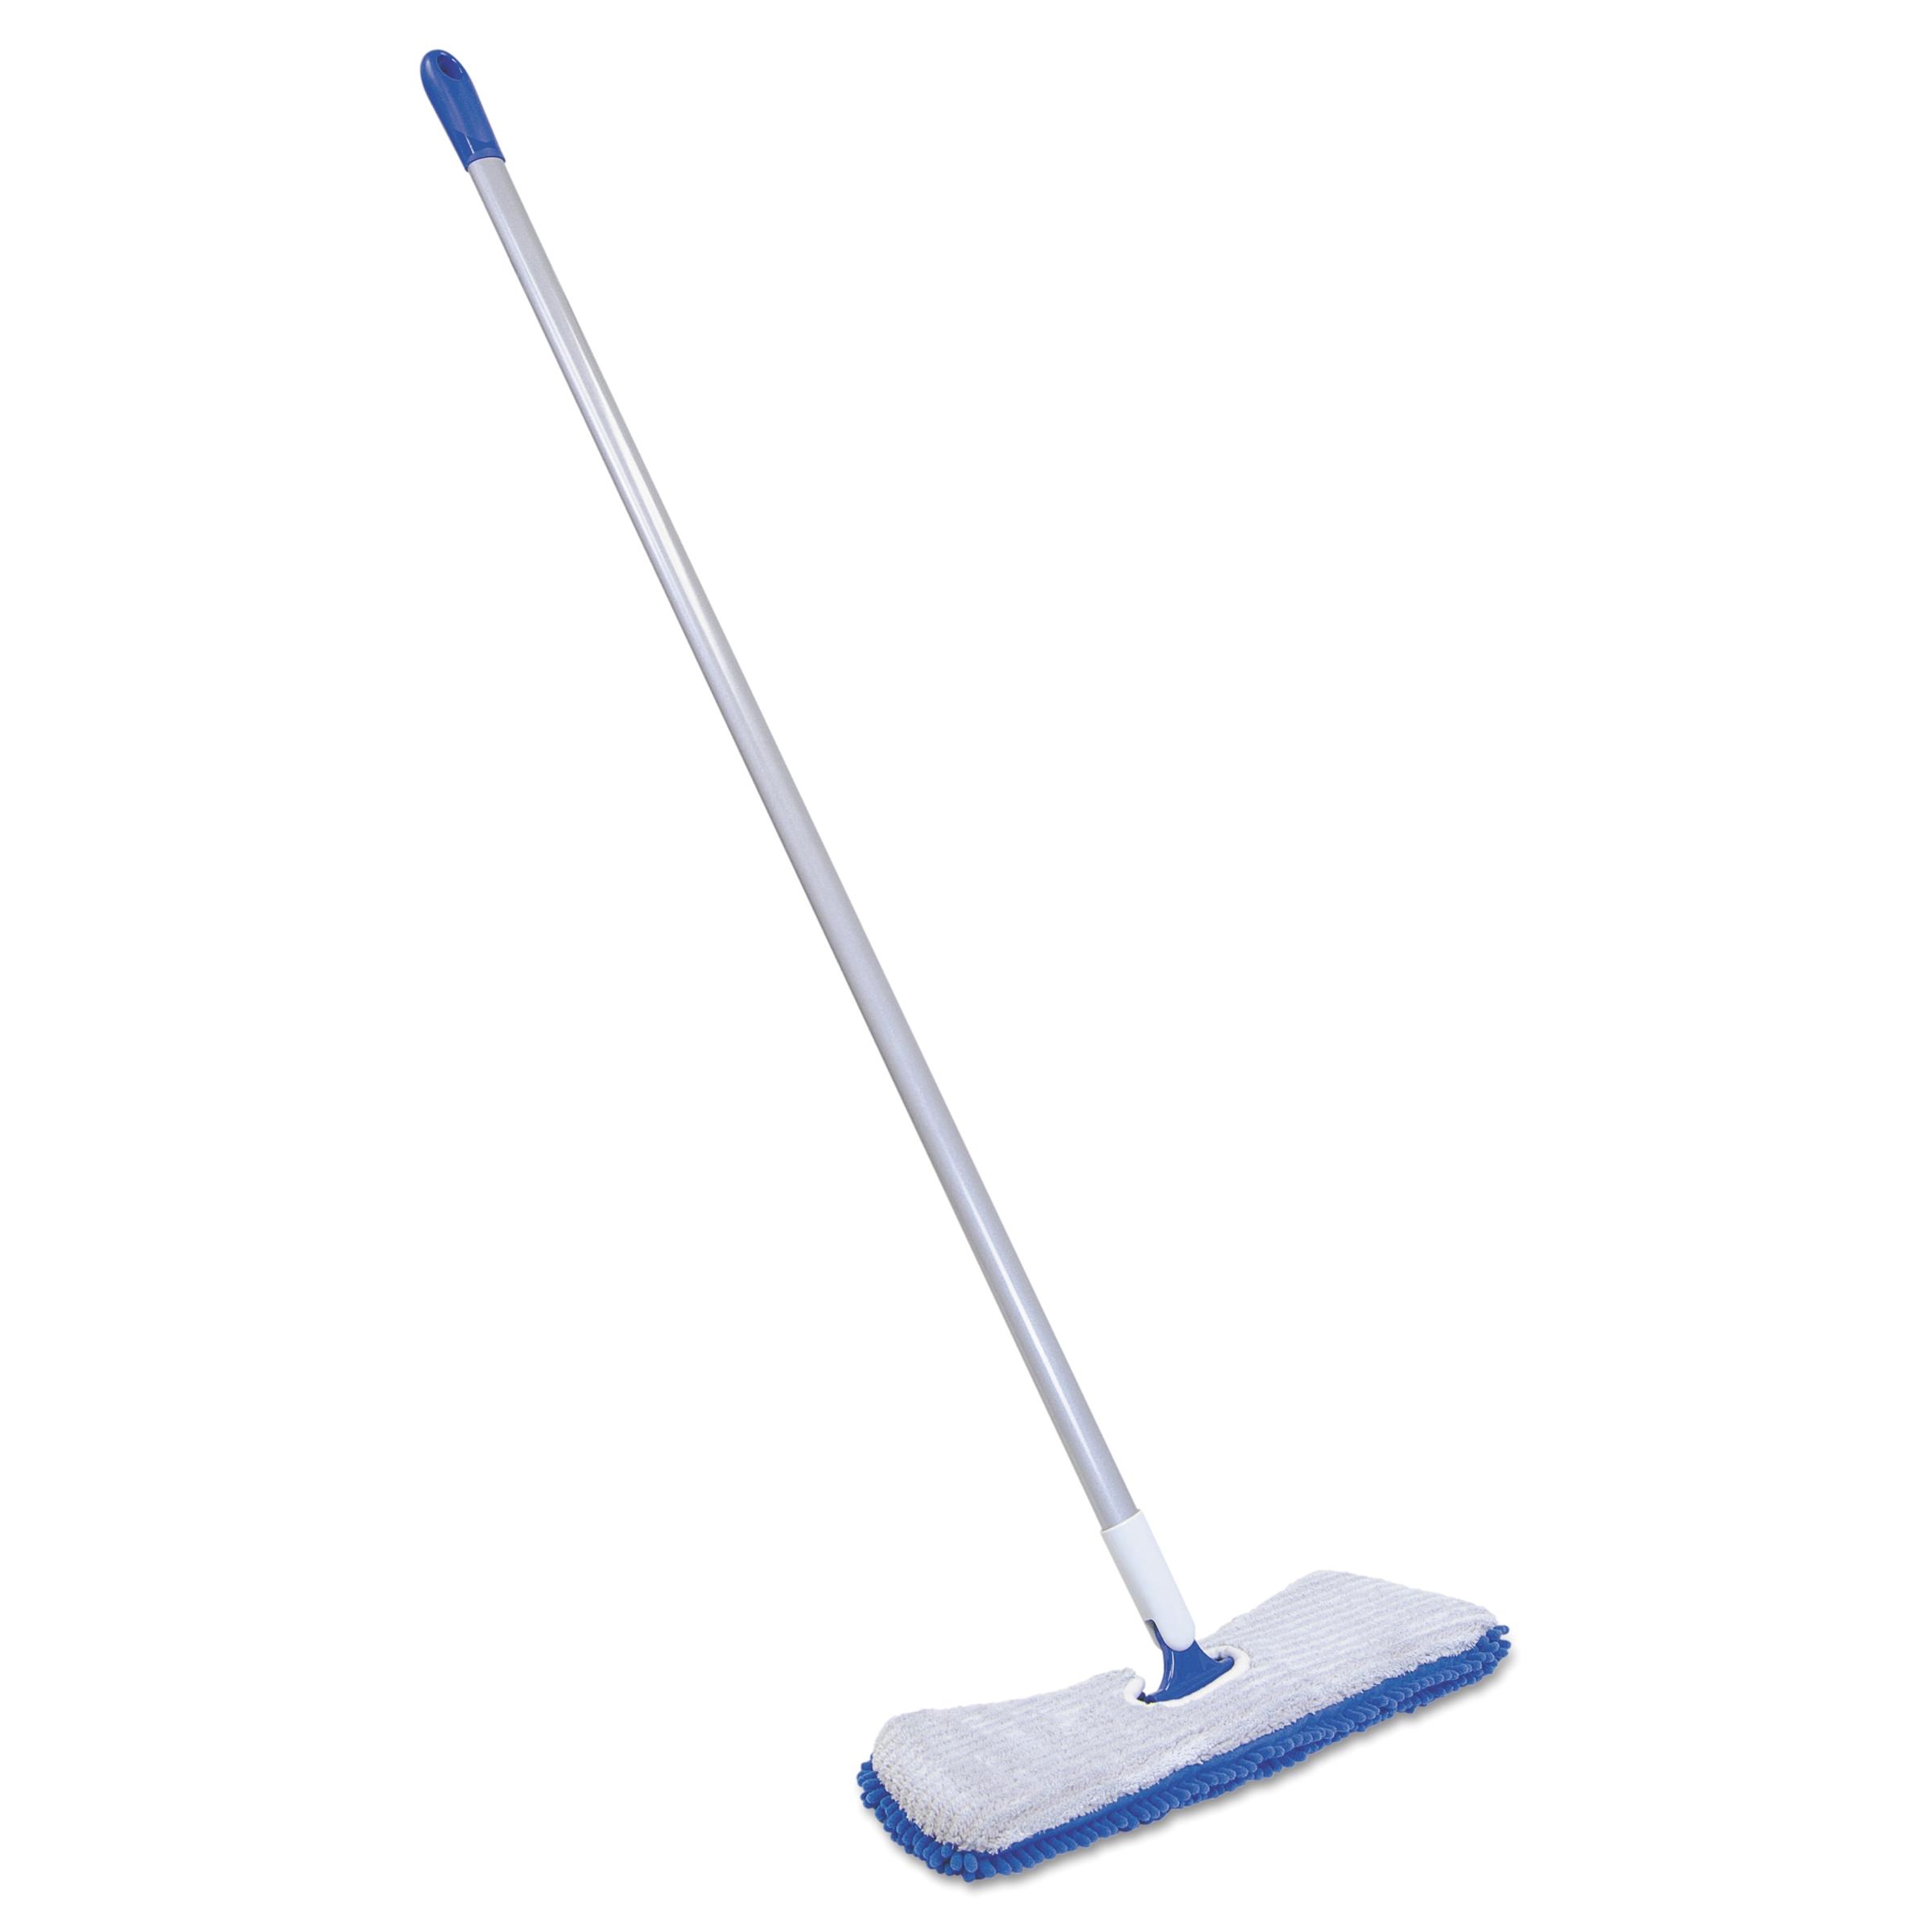 quickie flip amp shine microfiber floor mop 19 1 2 head 48 handle blue gray walmart com